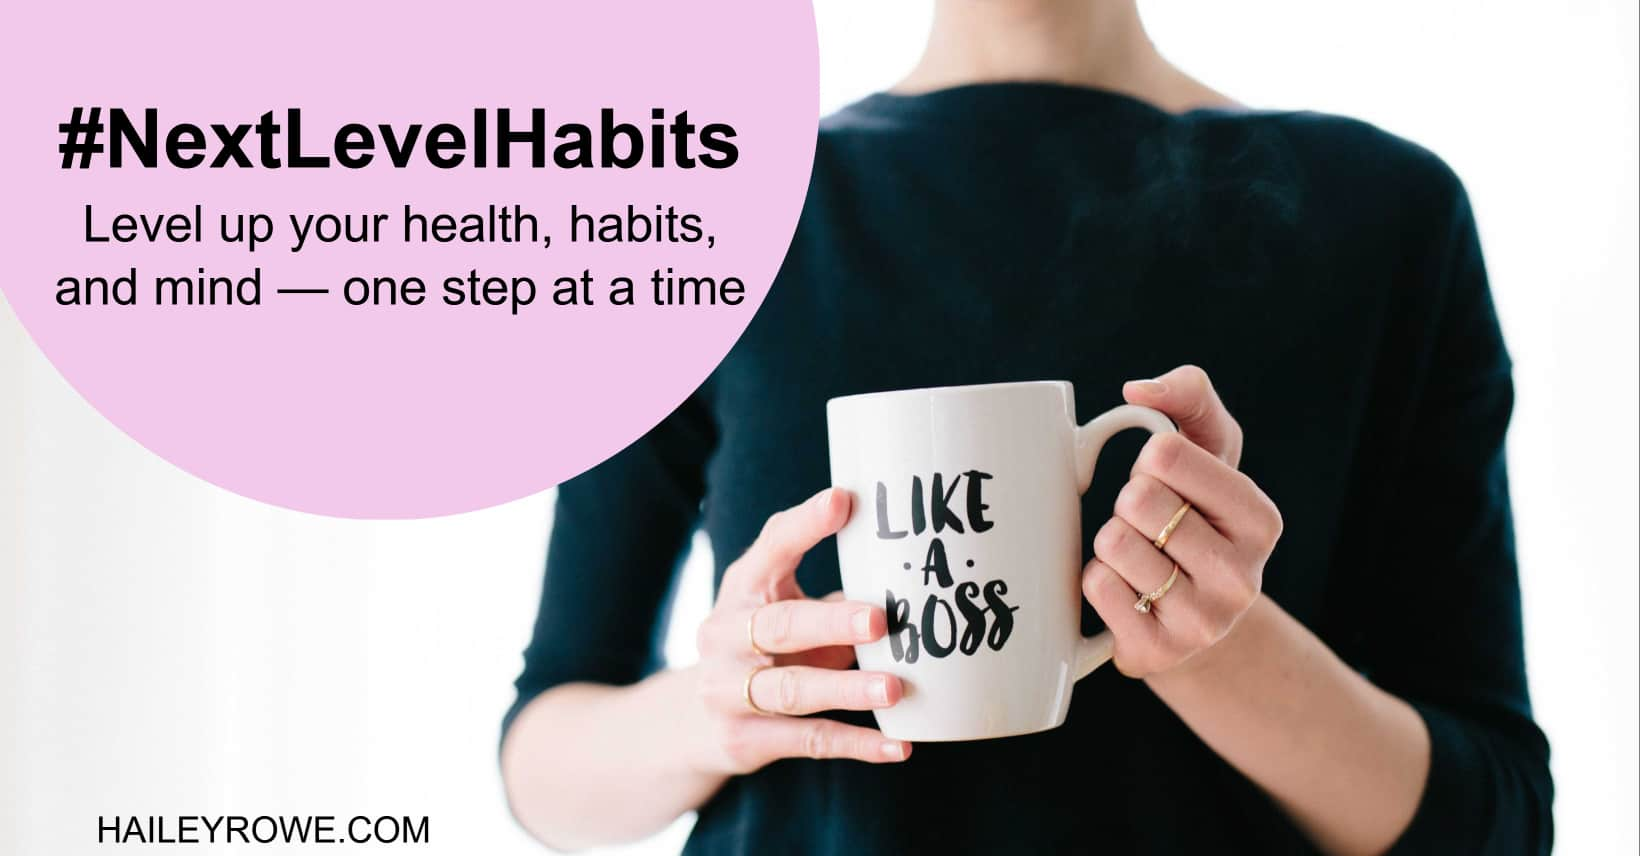 Next Level Habits